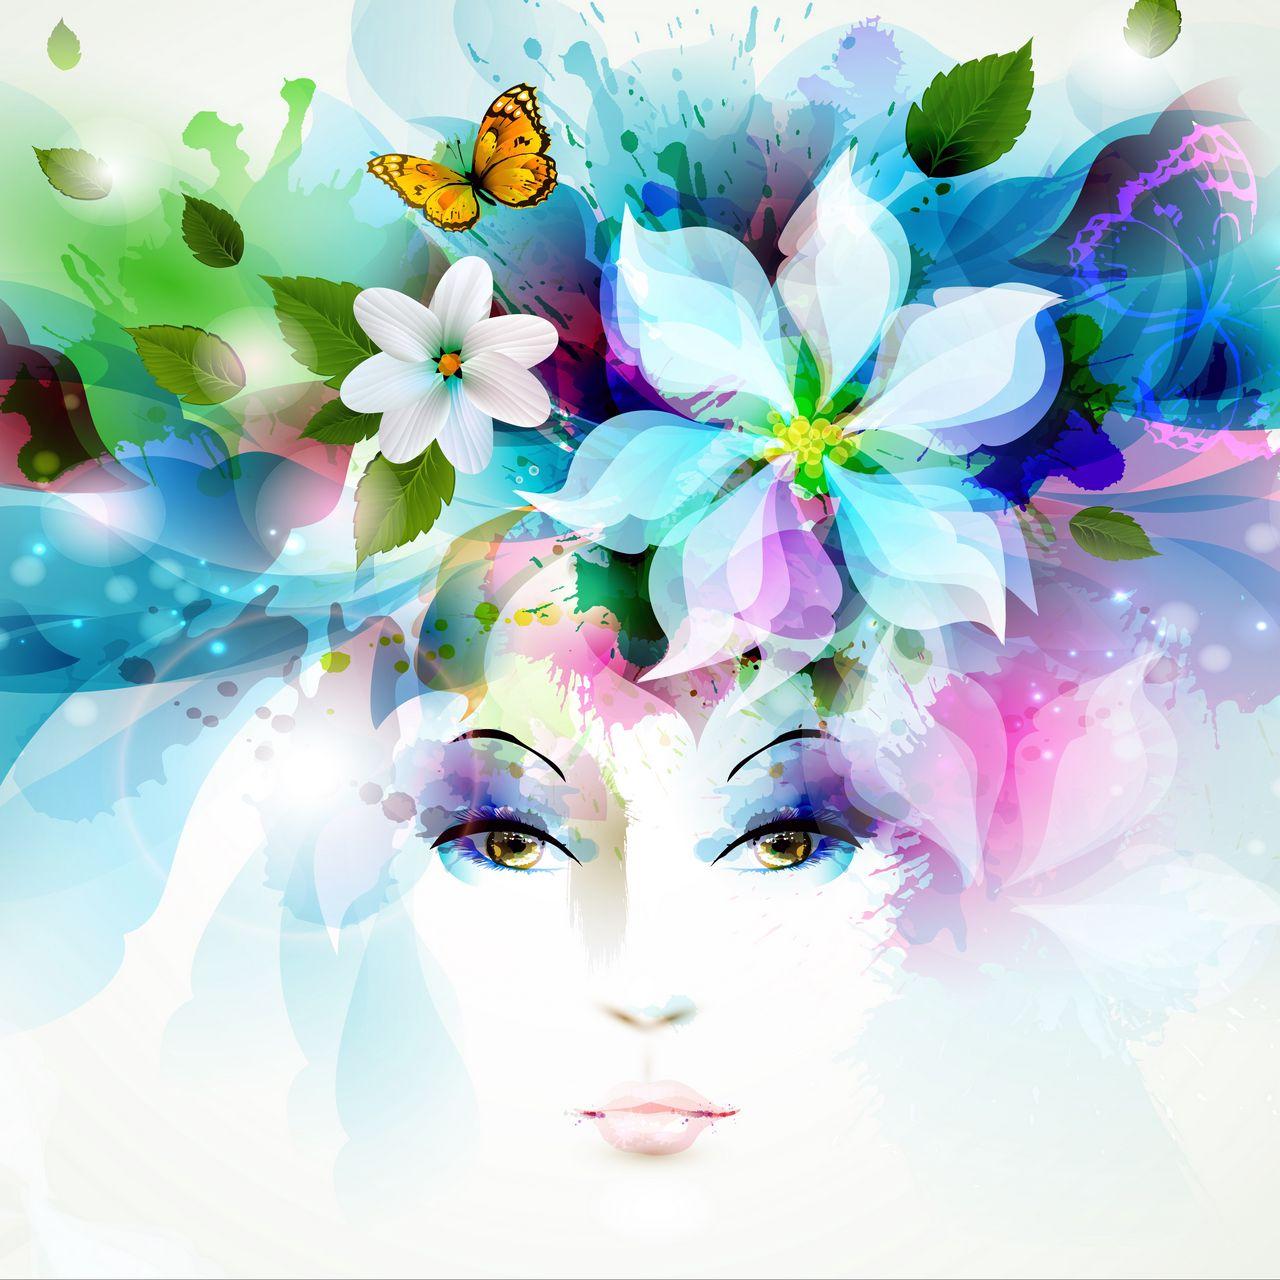 1280x1280 Wallpaper art, girl, eyes, flowers, petals, butterfly, leaves, spray